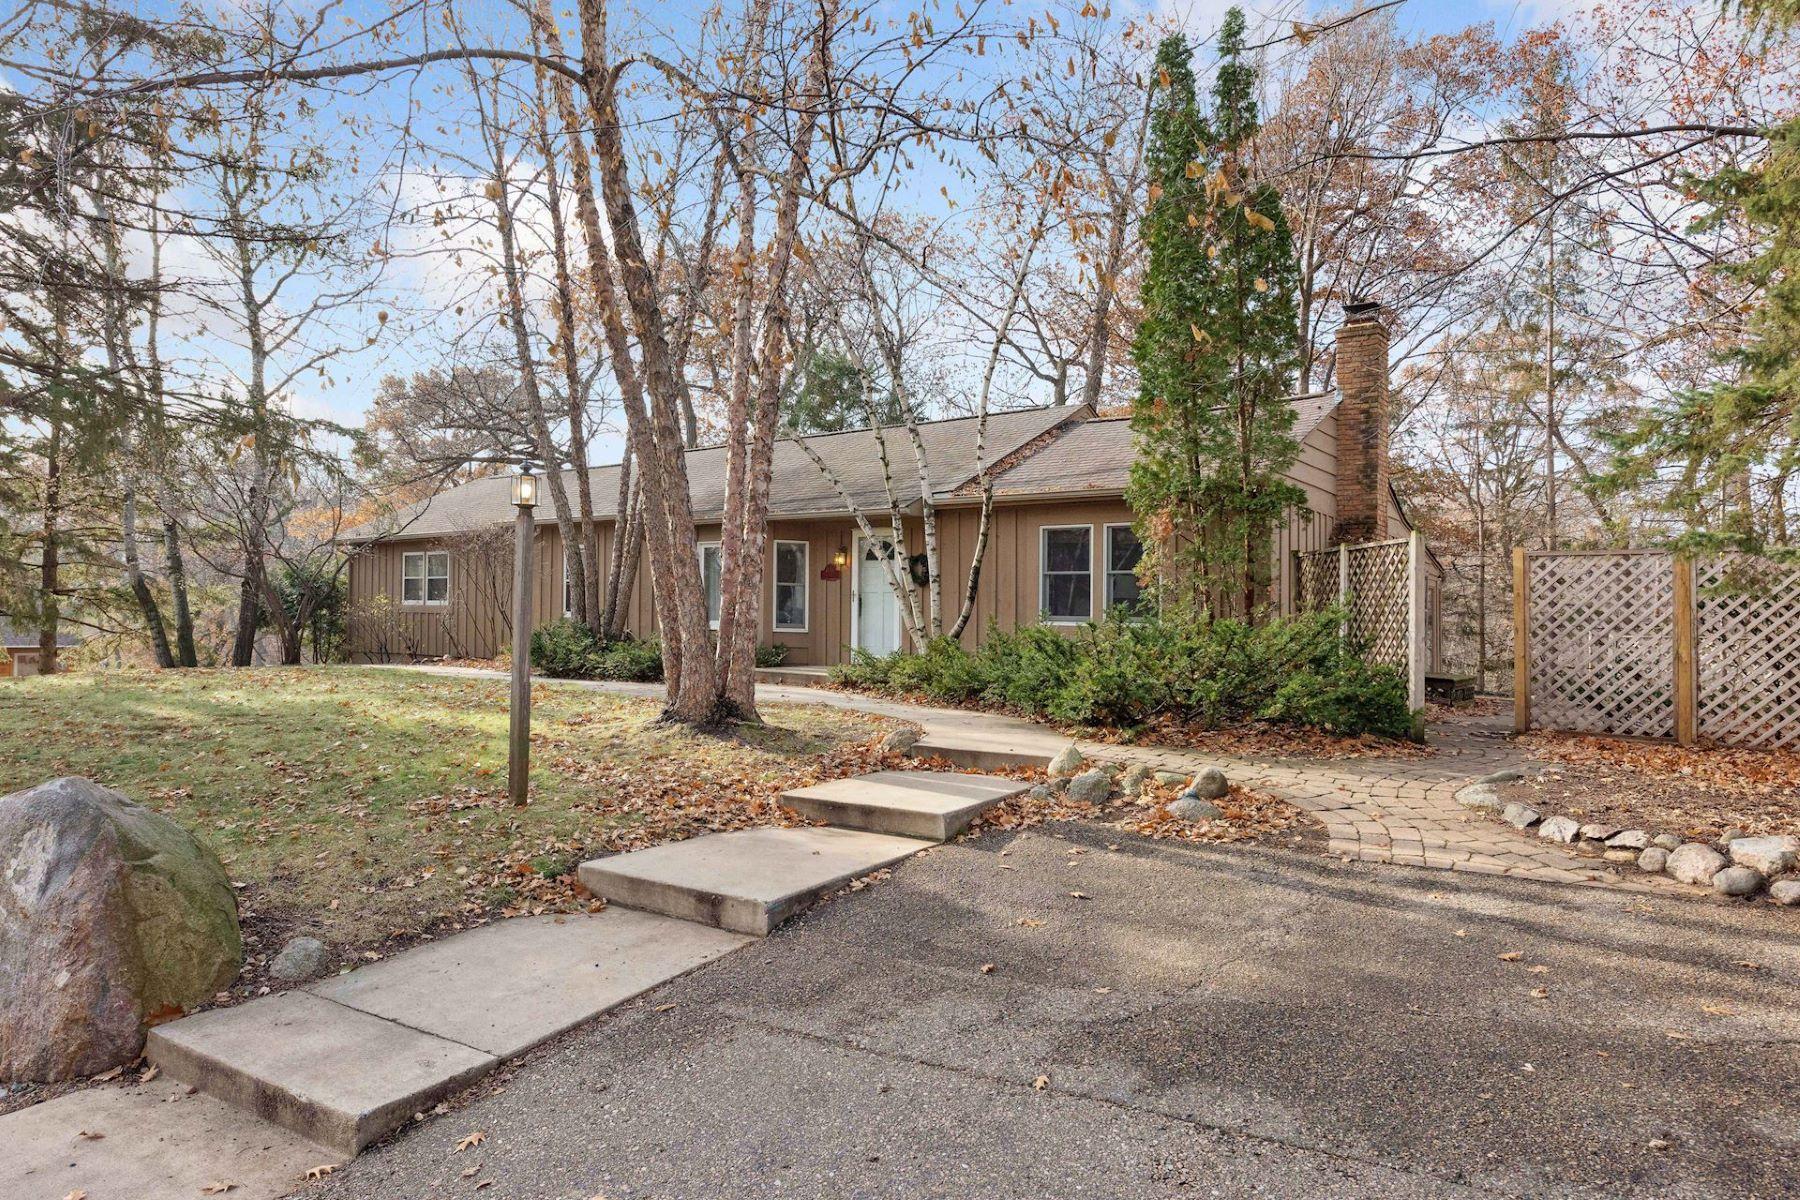 Single Family Homes for Sale at 4836 Ridge Road Minnetonka, Minnesota 55345 United States